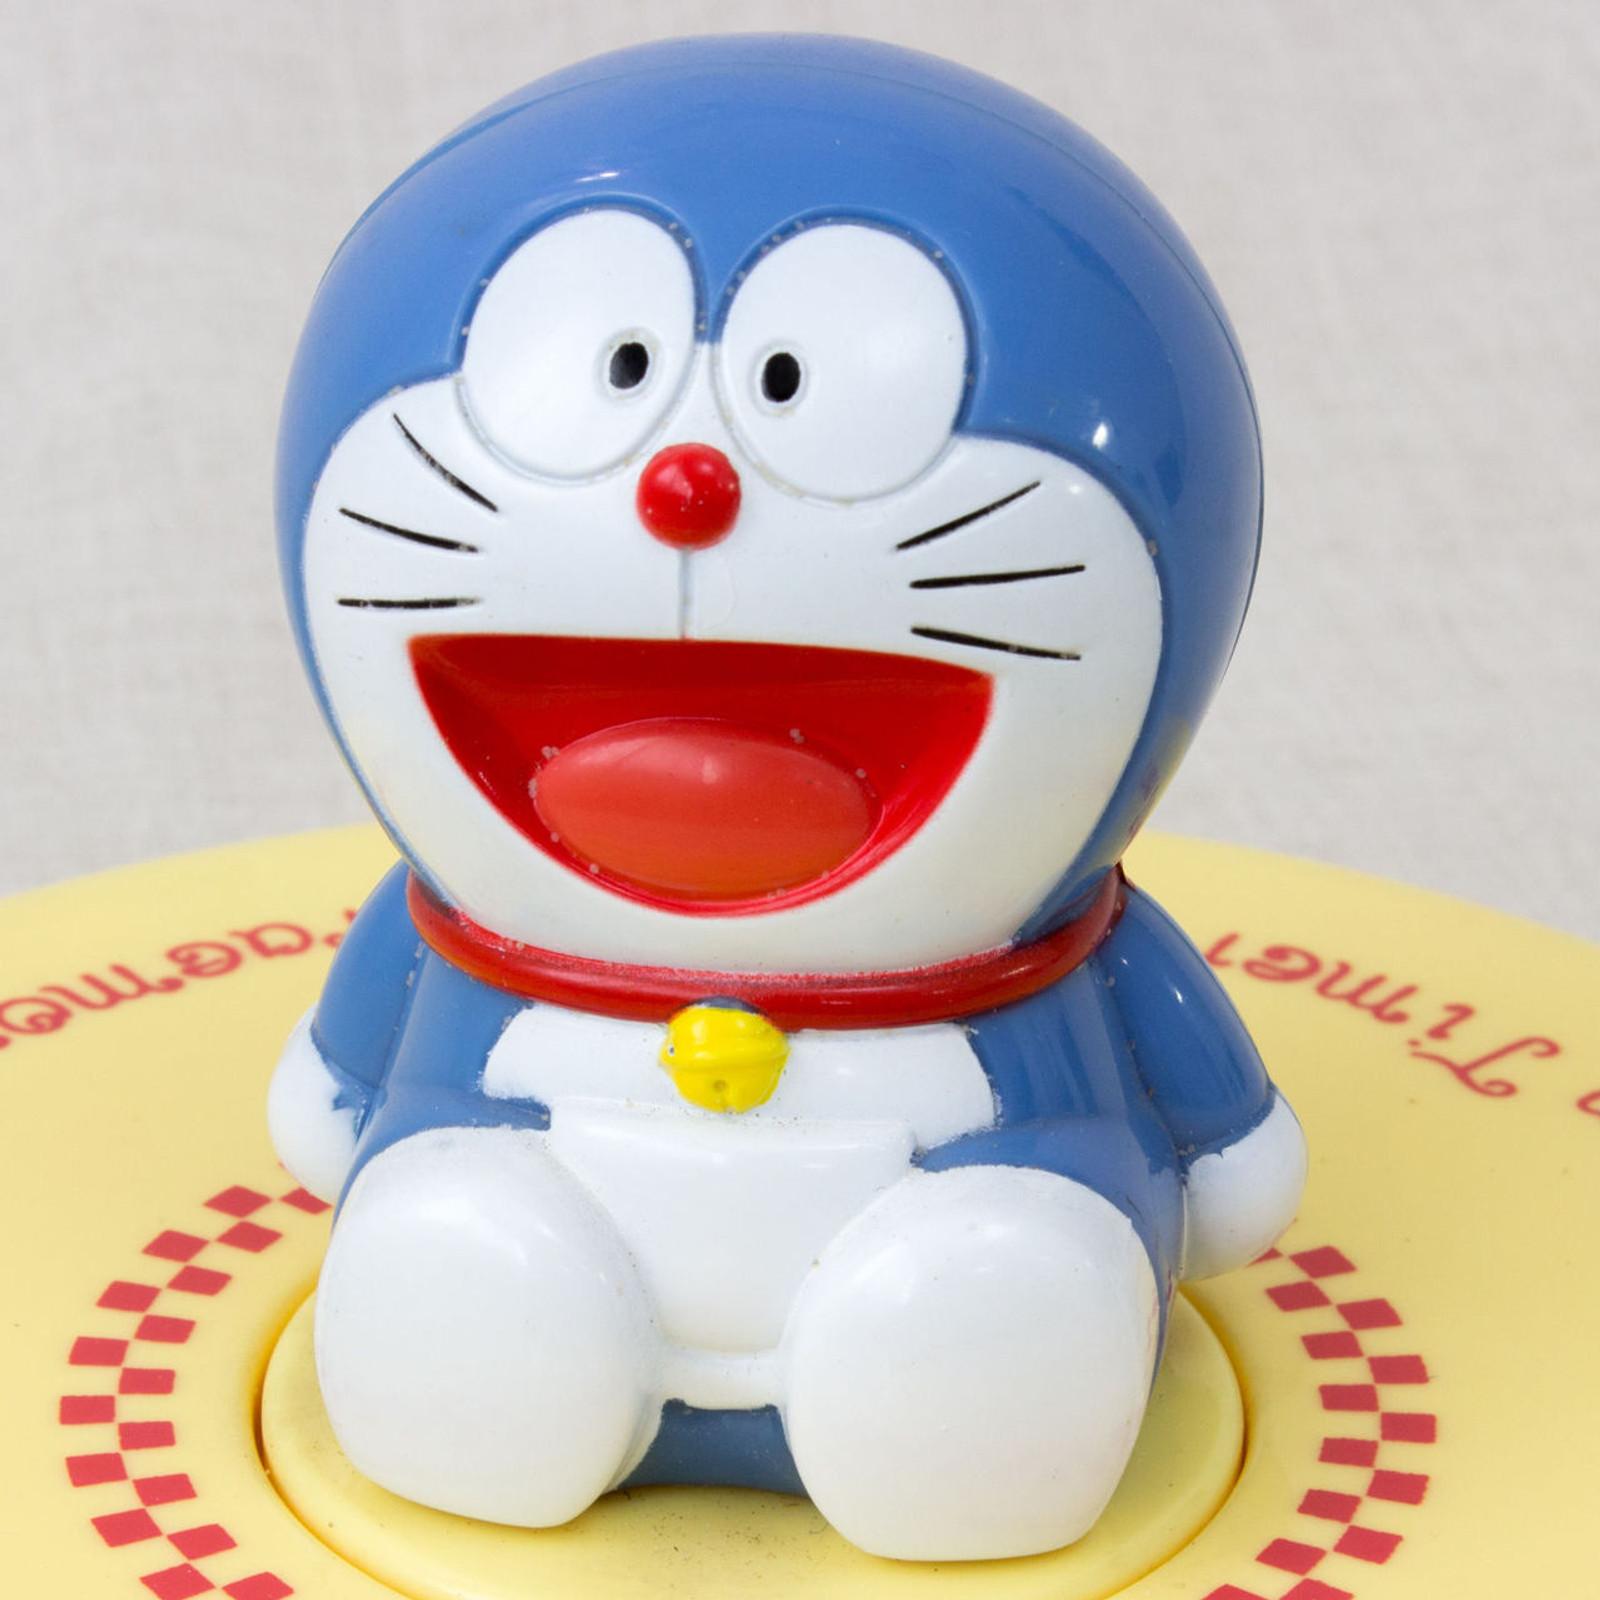 Doraemon 3 minute Sound Alarm Timer Figure for Cup Noodles JAPAN ANIME MANGA